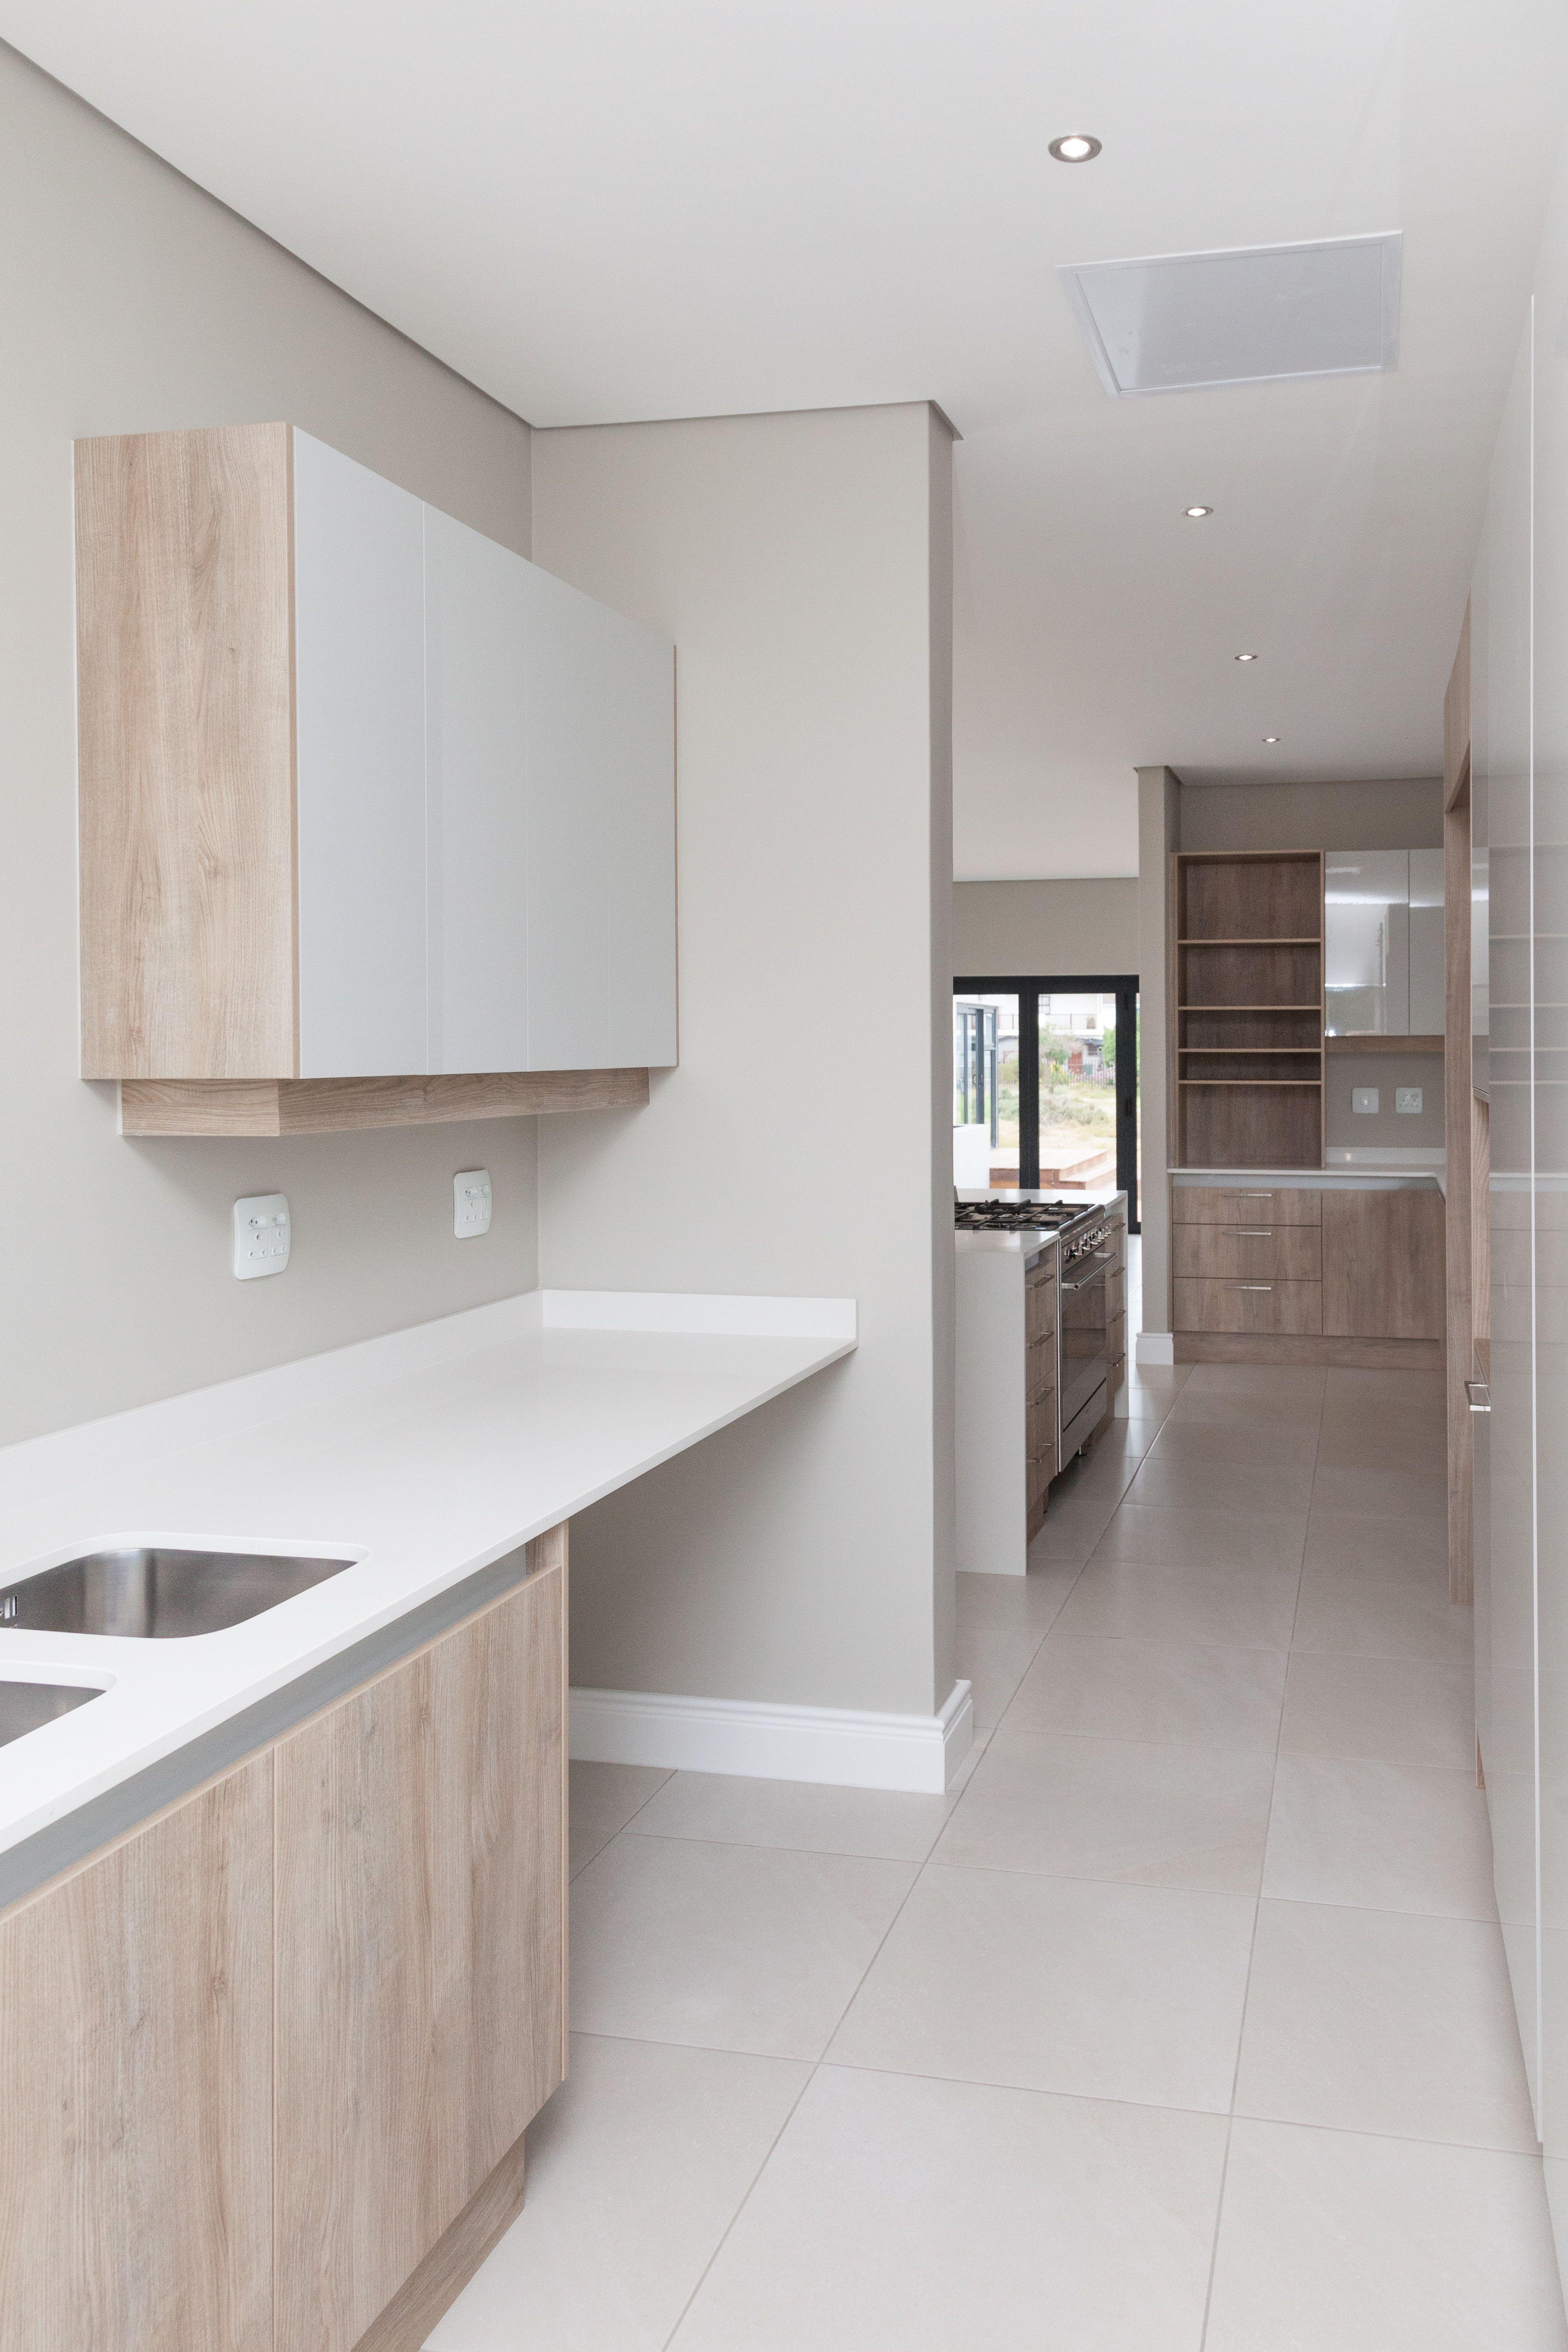 Modern Scullery Laundry Kitchen Interior Design Ideas, 9 on ...